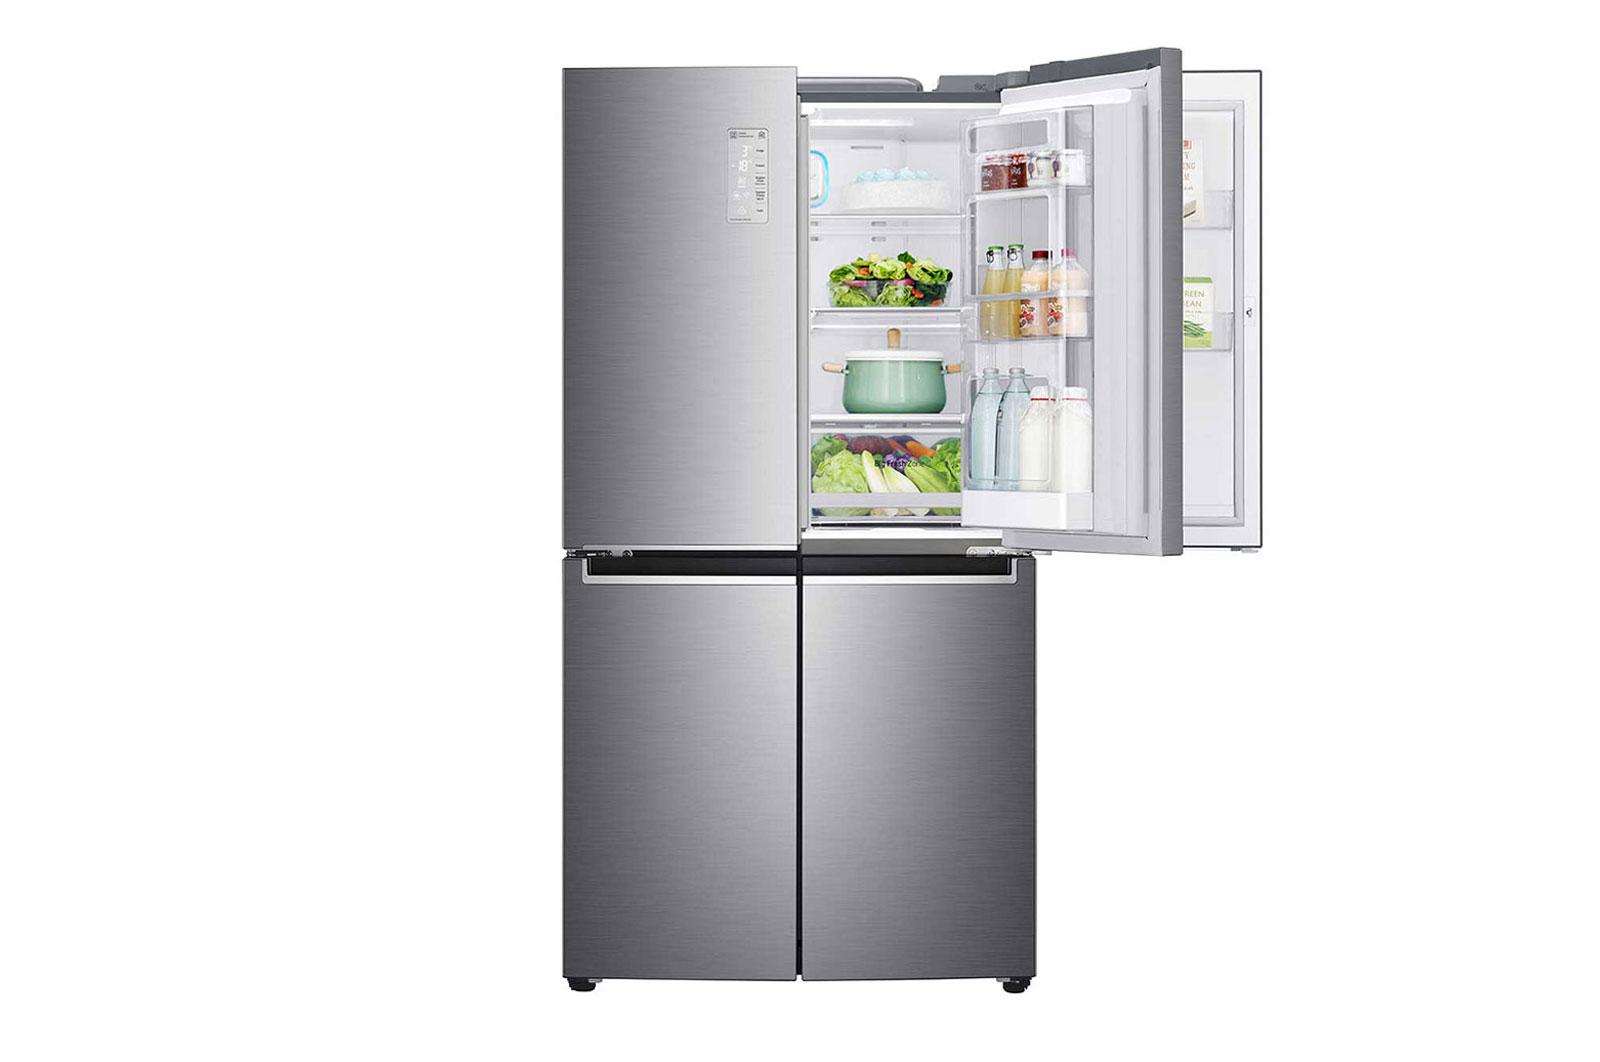 LG 4 Door Refrigerator Inverter Linear Compressor GRD-274PN